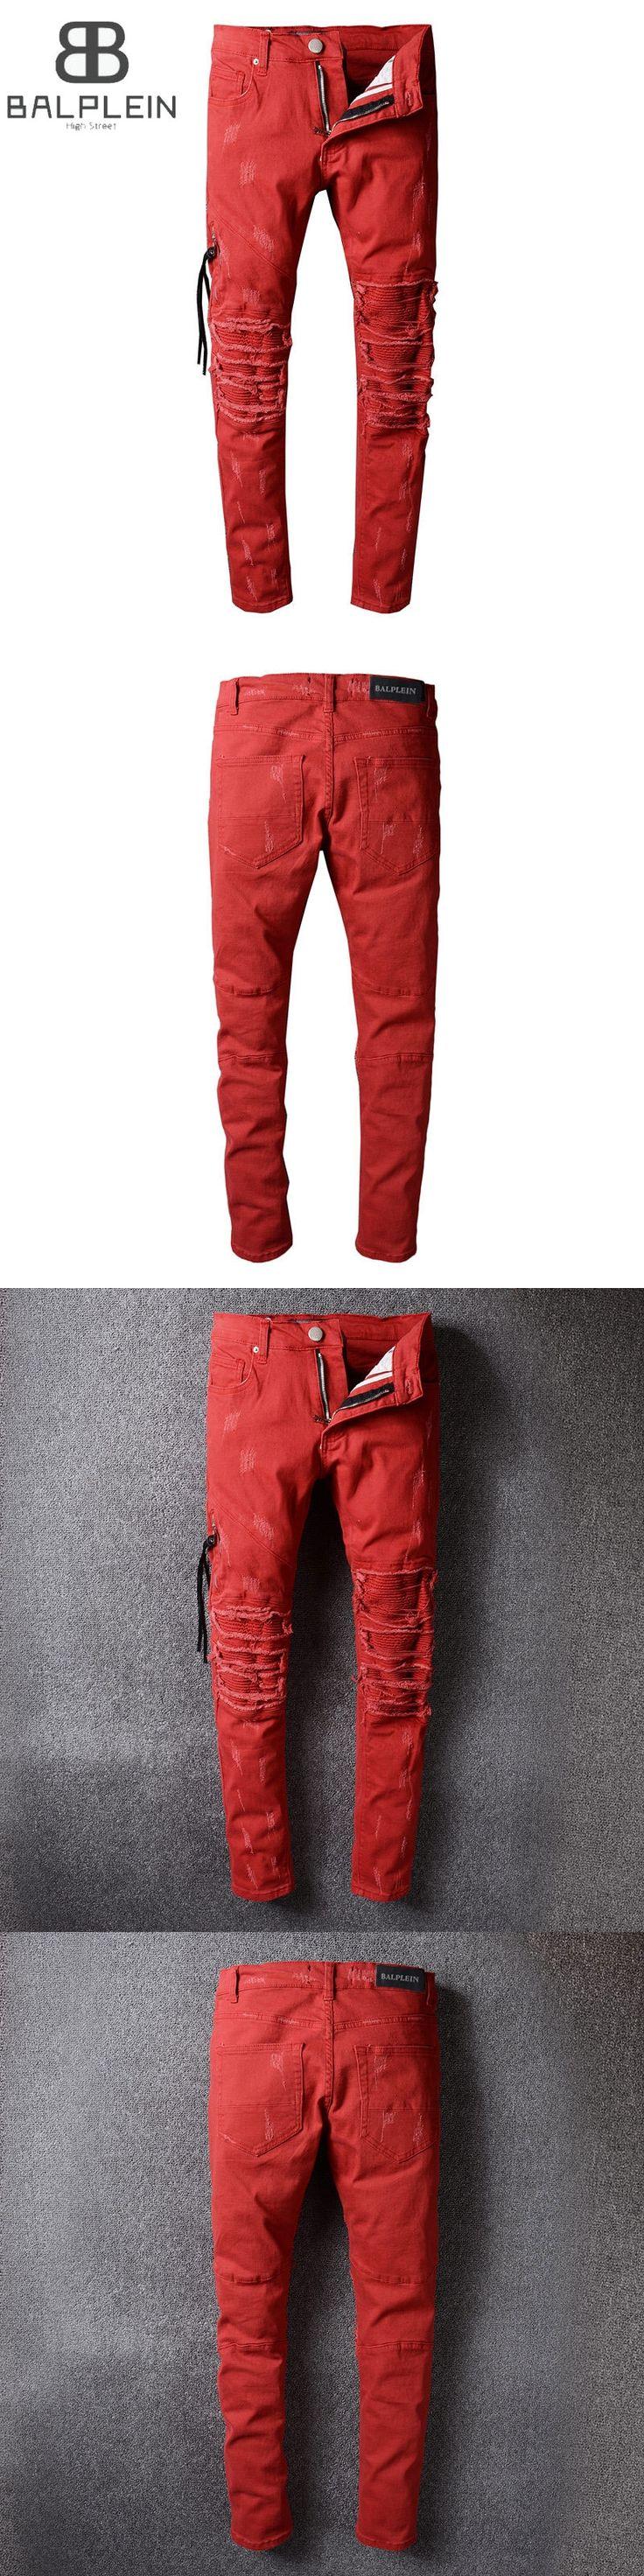 Red Color High Street Fashion Mens Jeans Motor Biker Jeans Men Balplein Brand Destroyed Ripped Jeans Punk Style Denim Pants